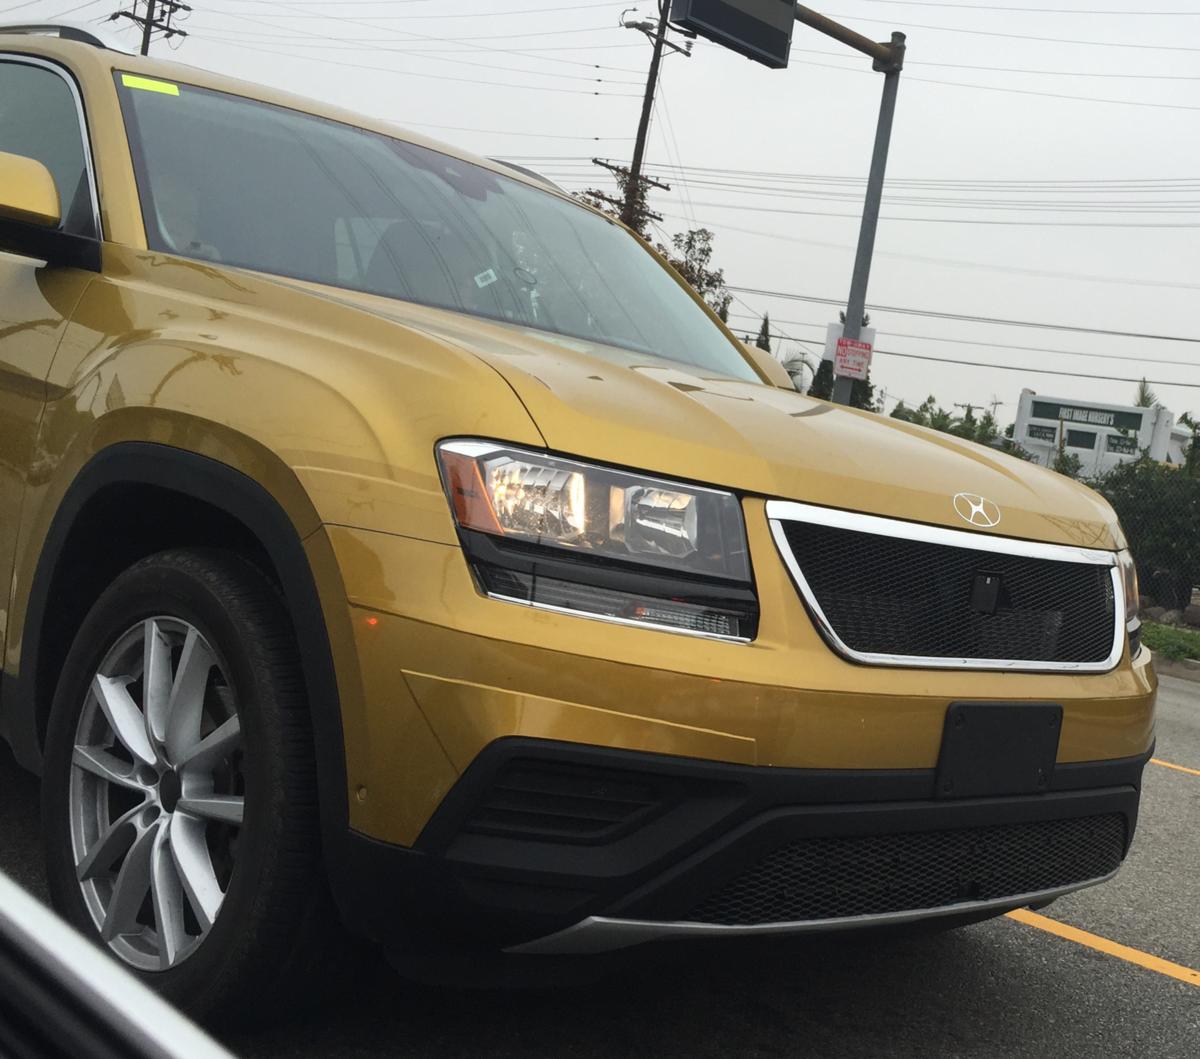 Suv Volkswagen: New Volkswagen Full-size SUV Begins Road Testing